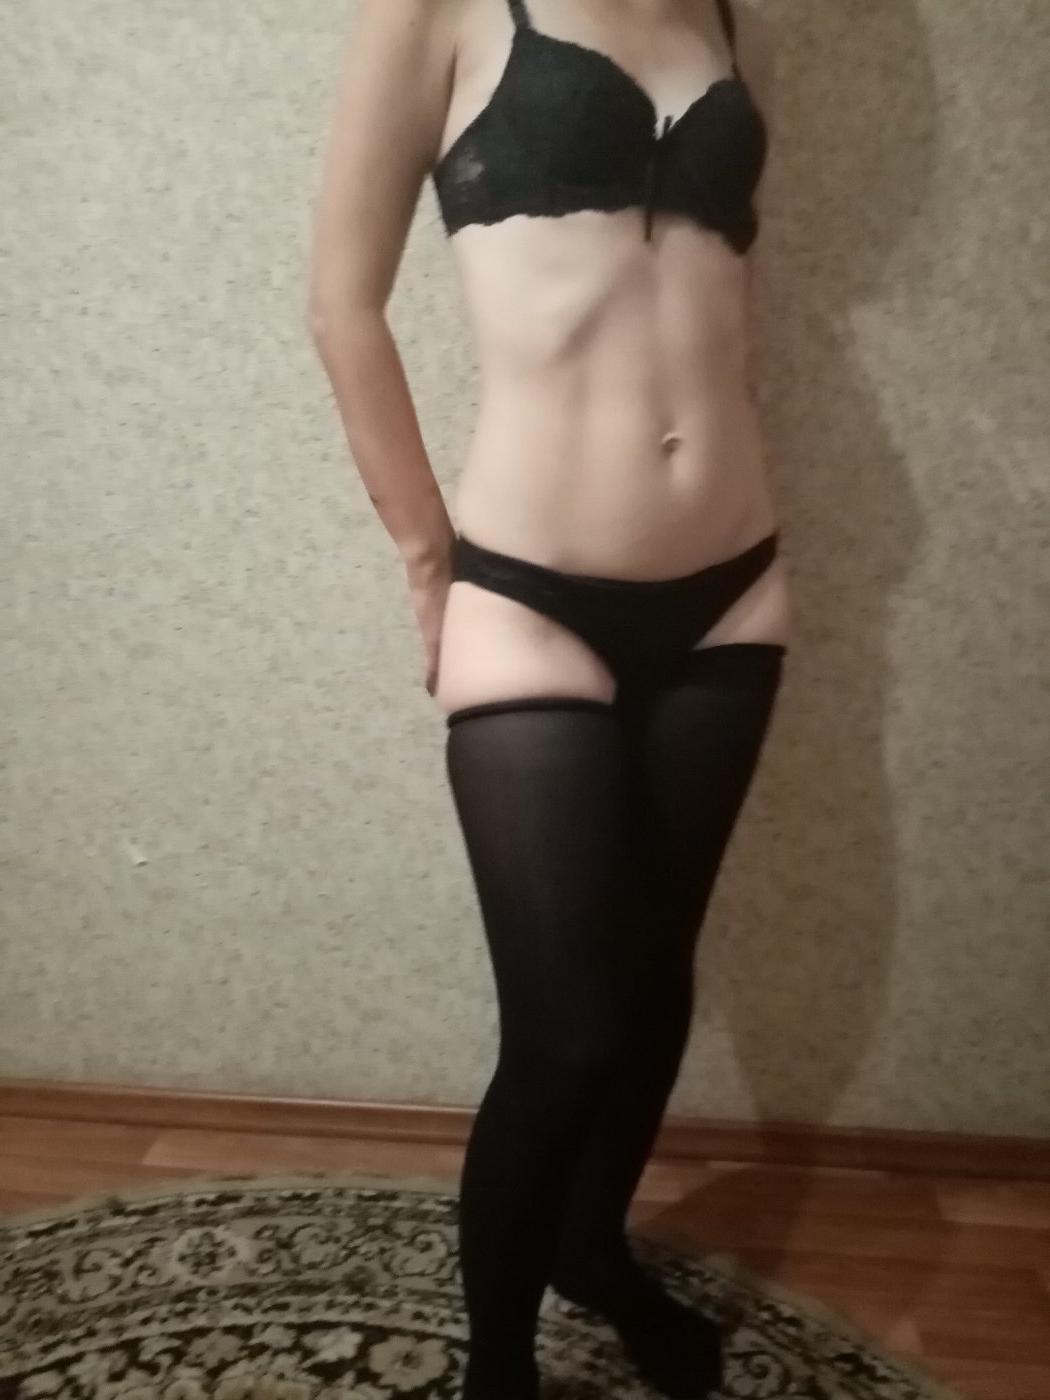 Проститутка Варенька, 33 года, метро Бульвар адмирала Ушакова